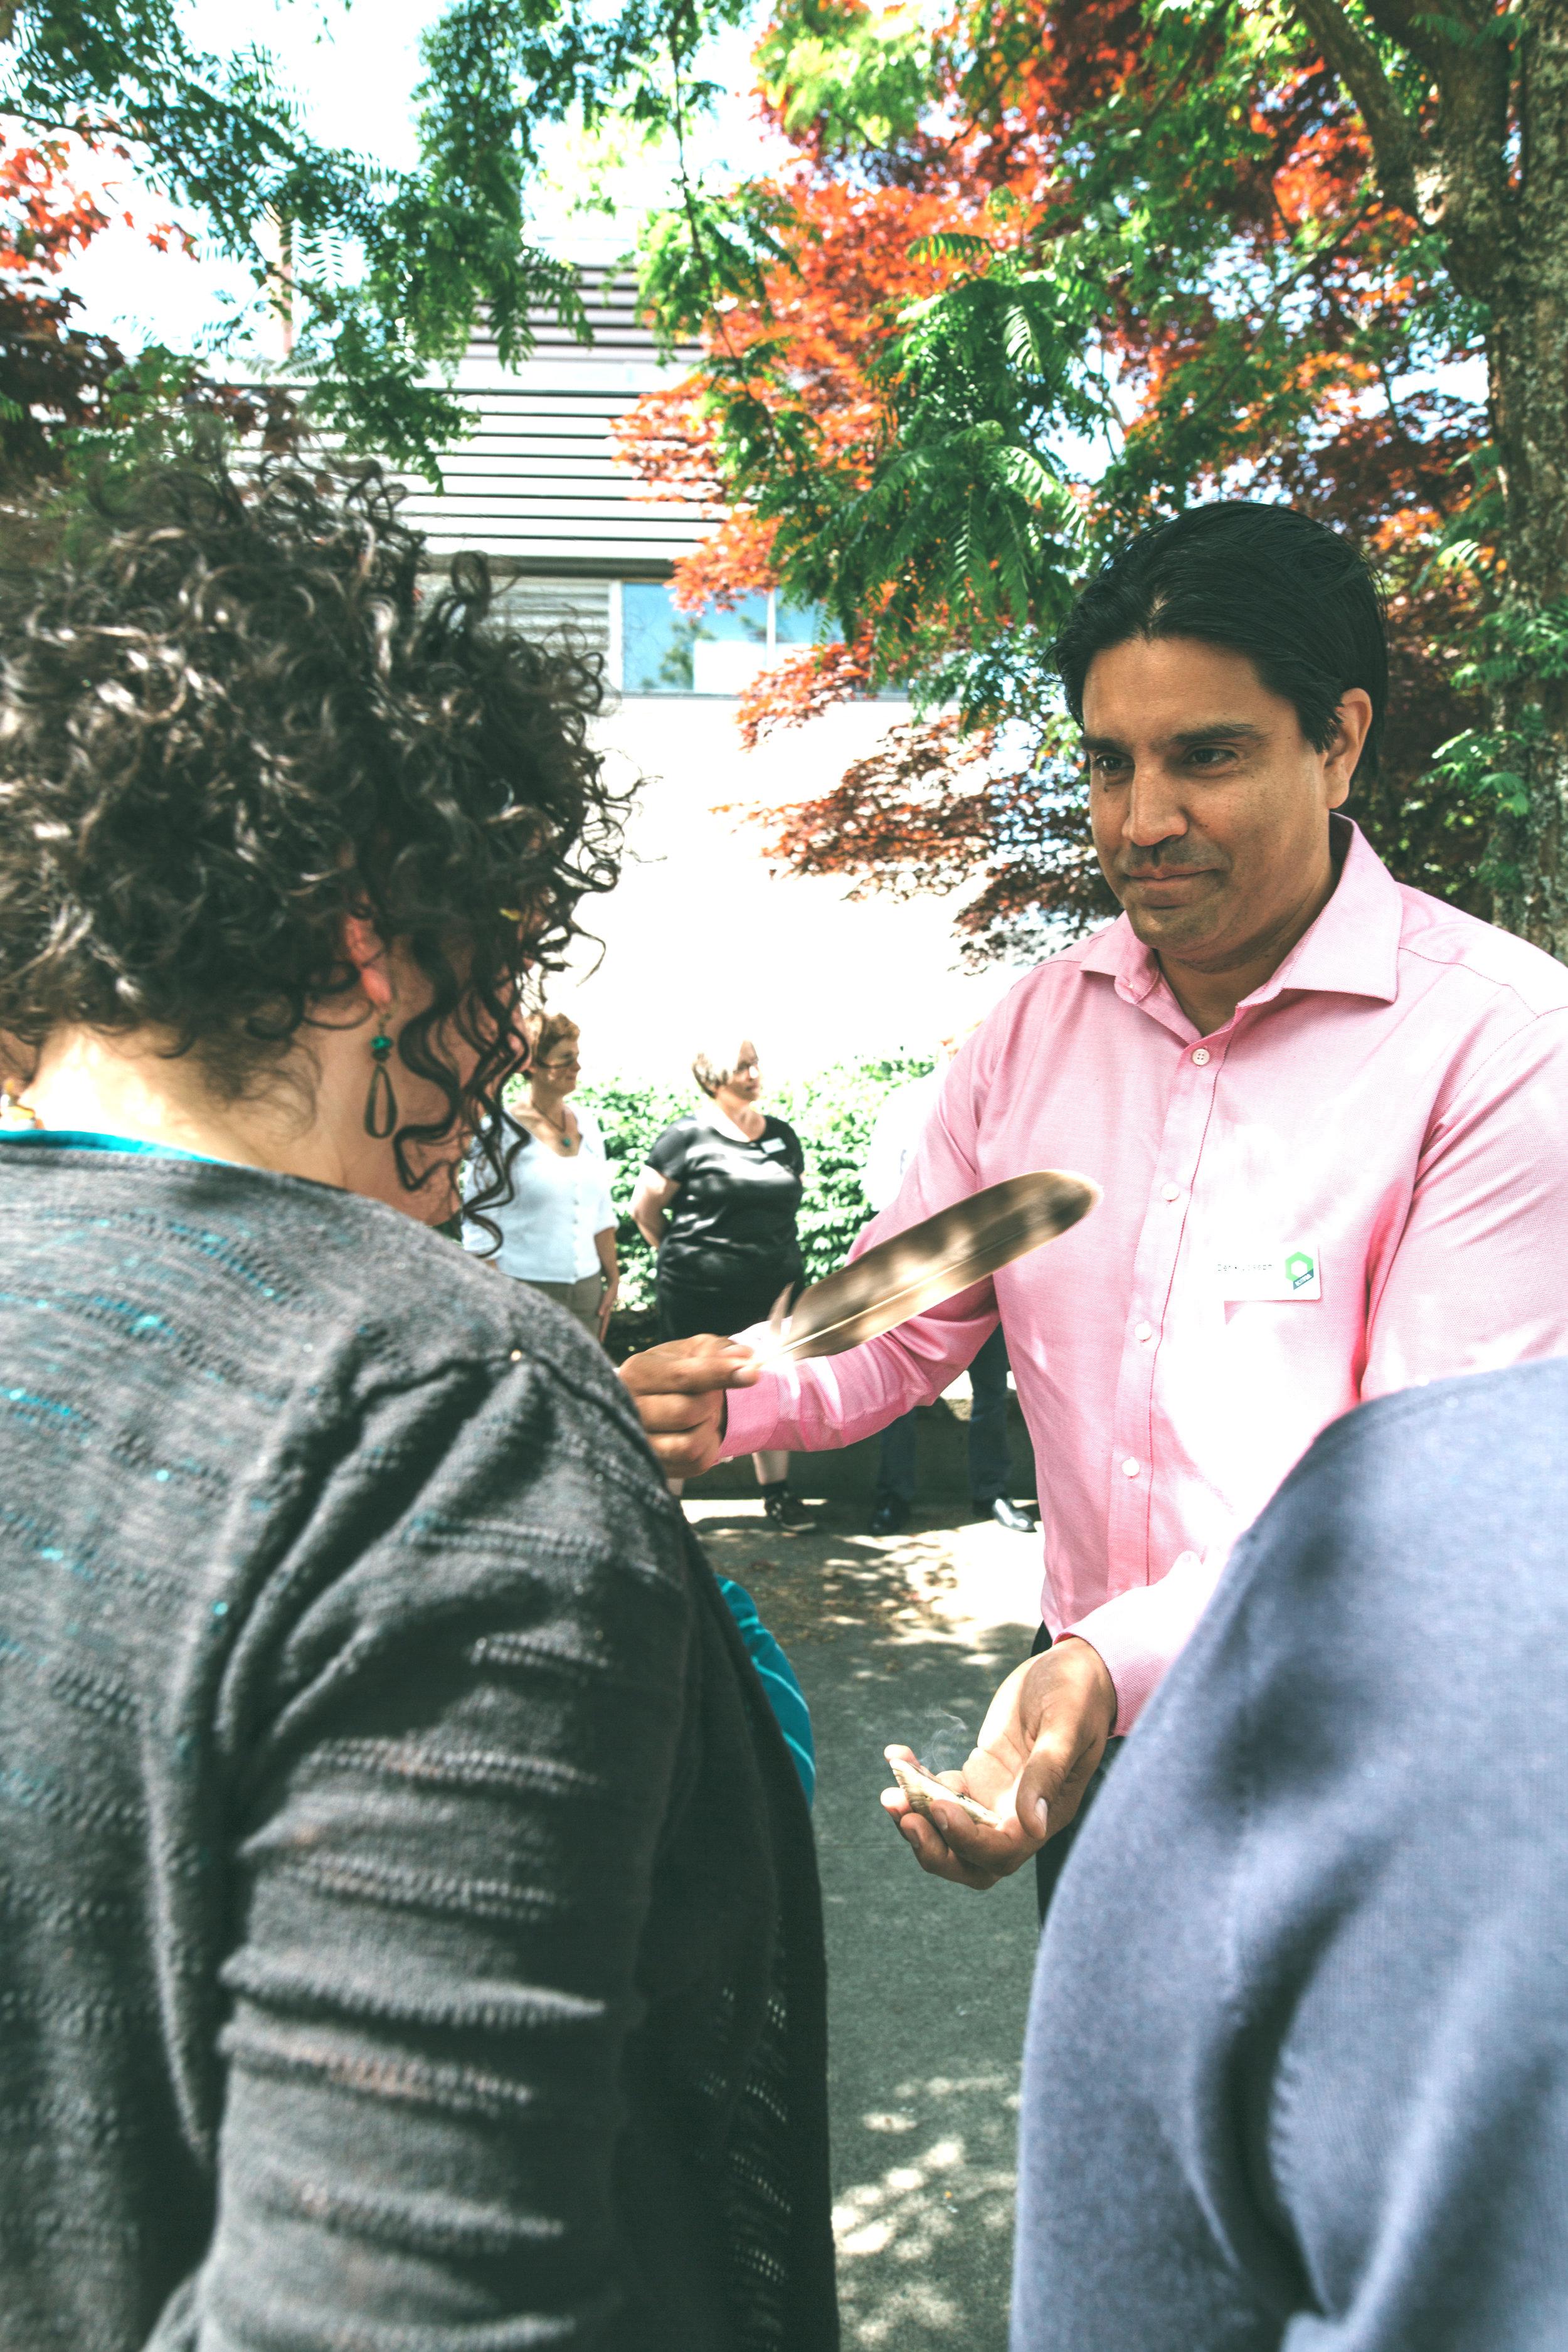 Diversity Circles Co-Creator Zaa Joseph participates in a group smudging ceremony.